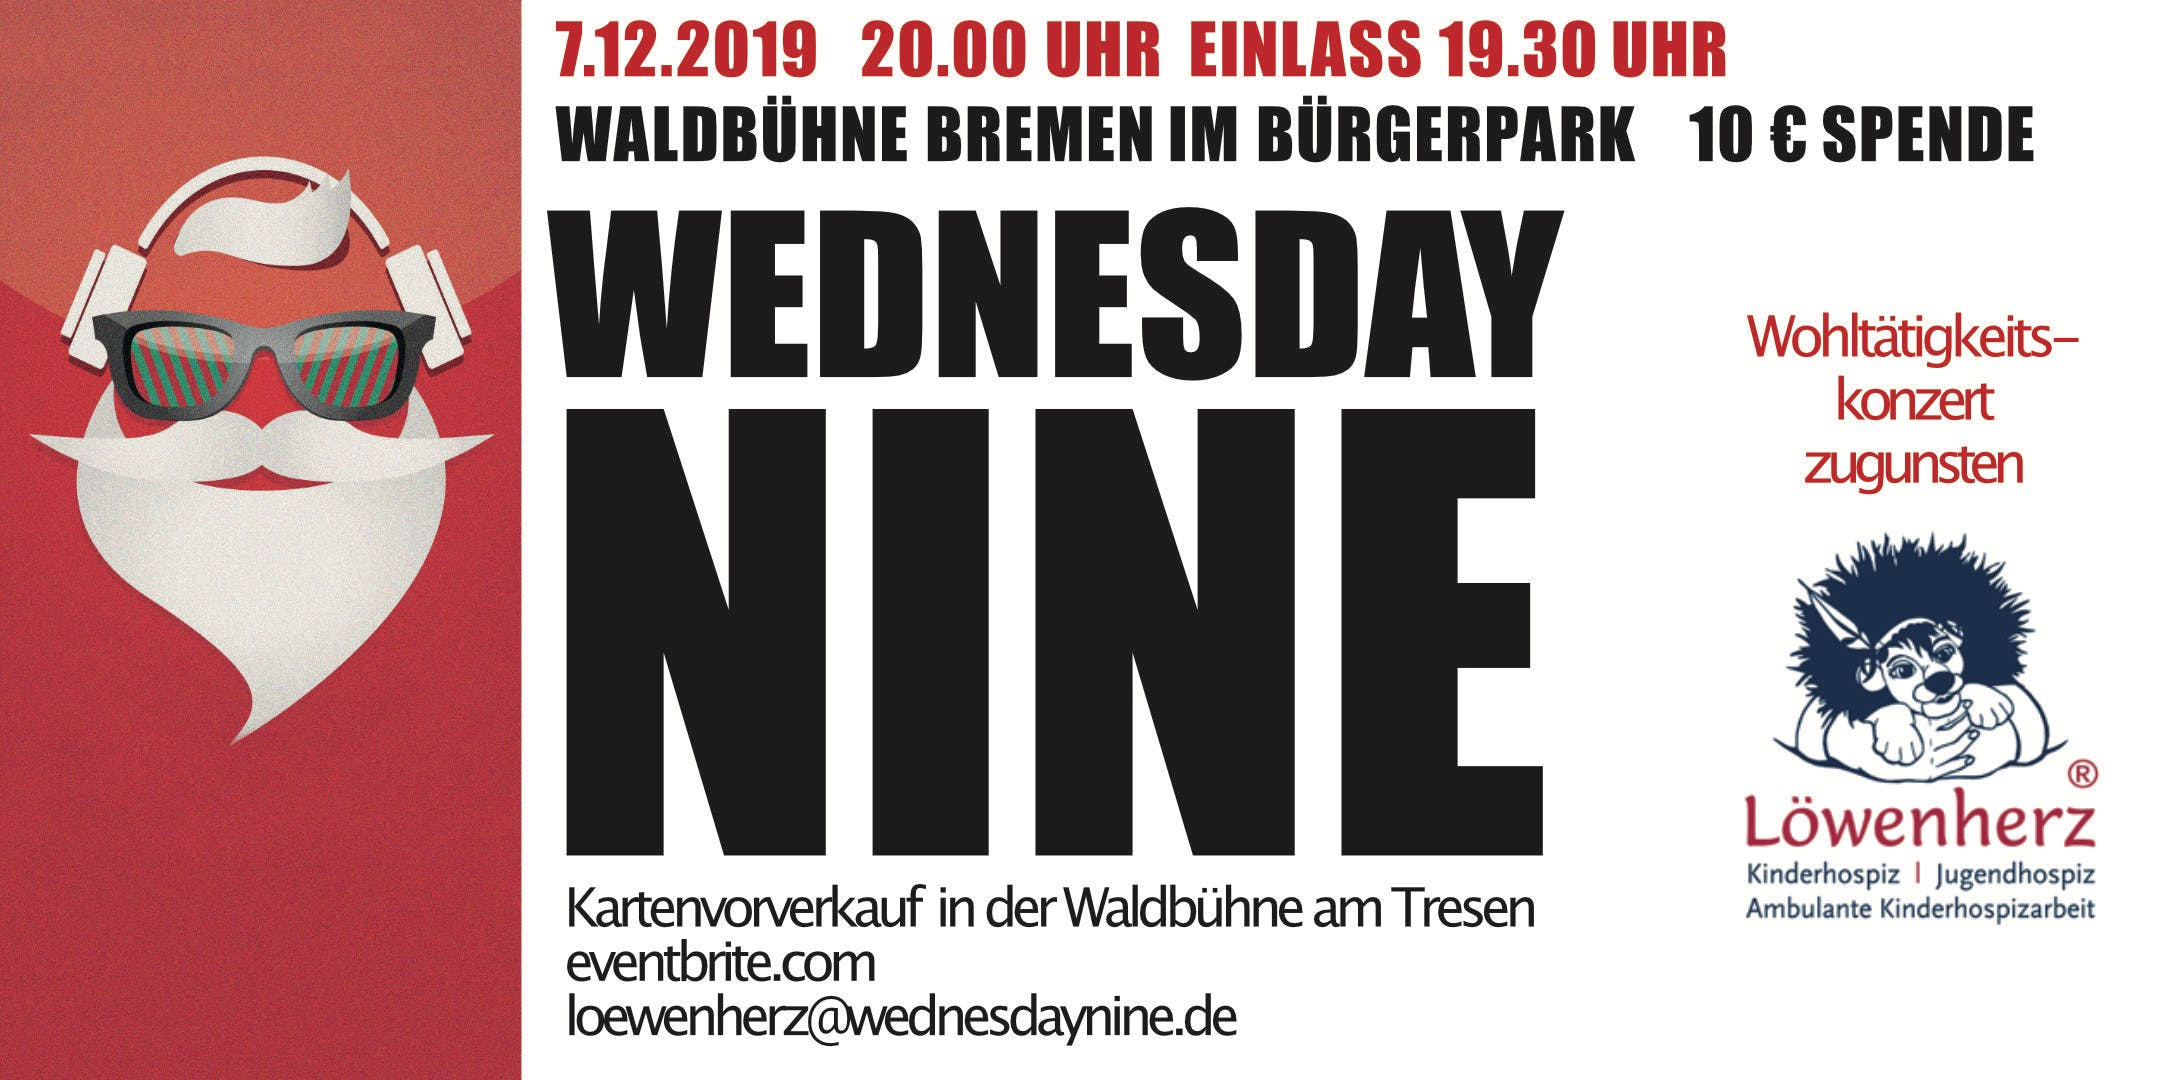 Jingle Bell Rock - Charity Concert - Wednesday Nine playing for Lwenherz